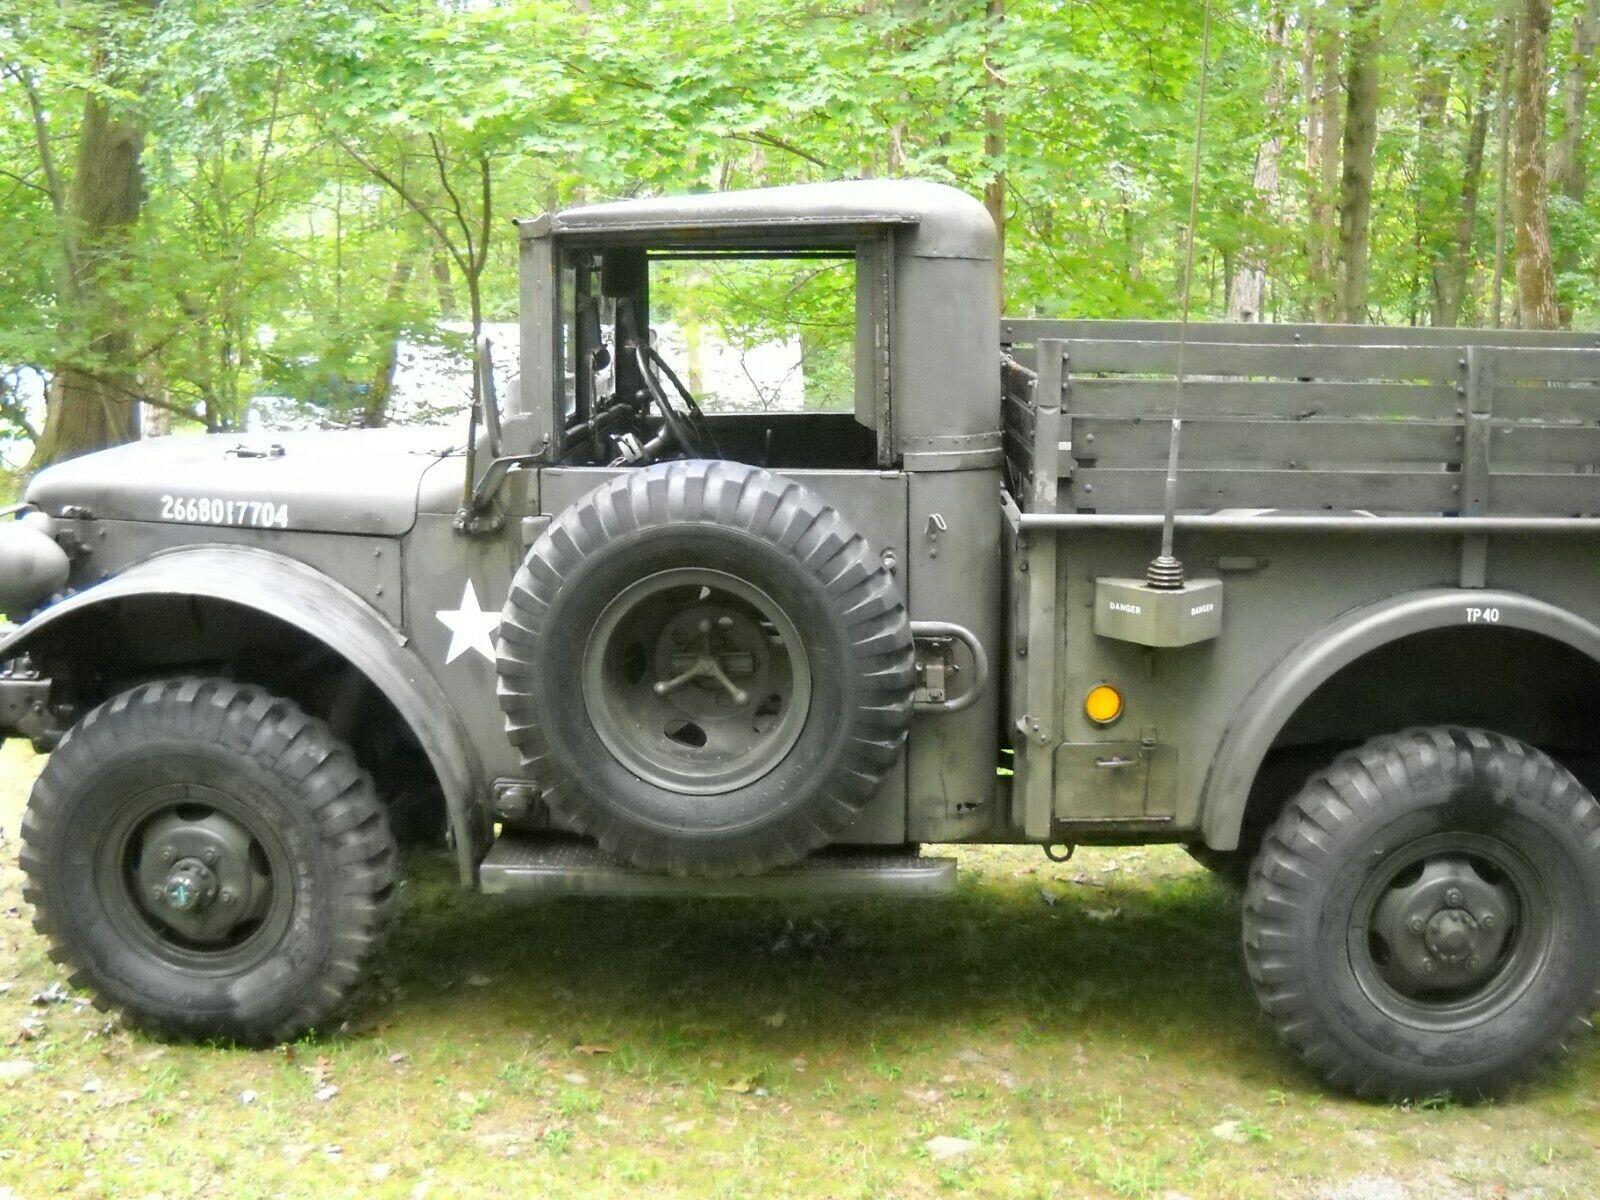 new parts 1965 Dodge M37B1 military